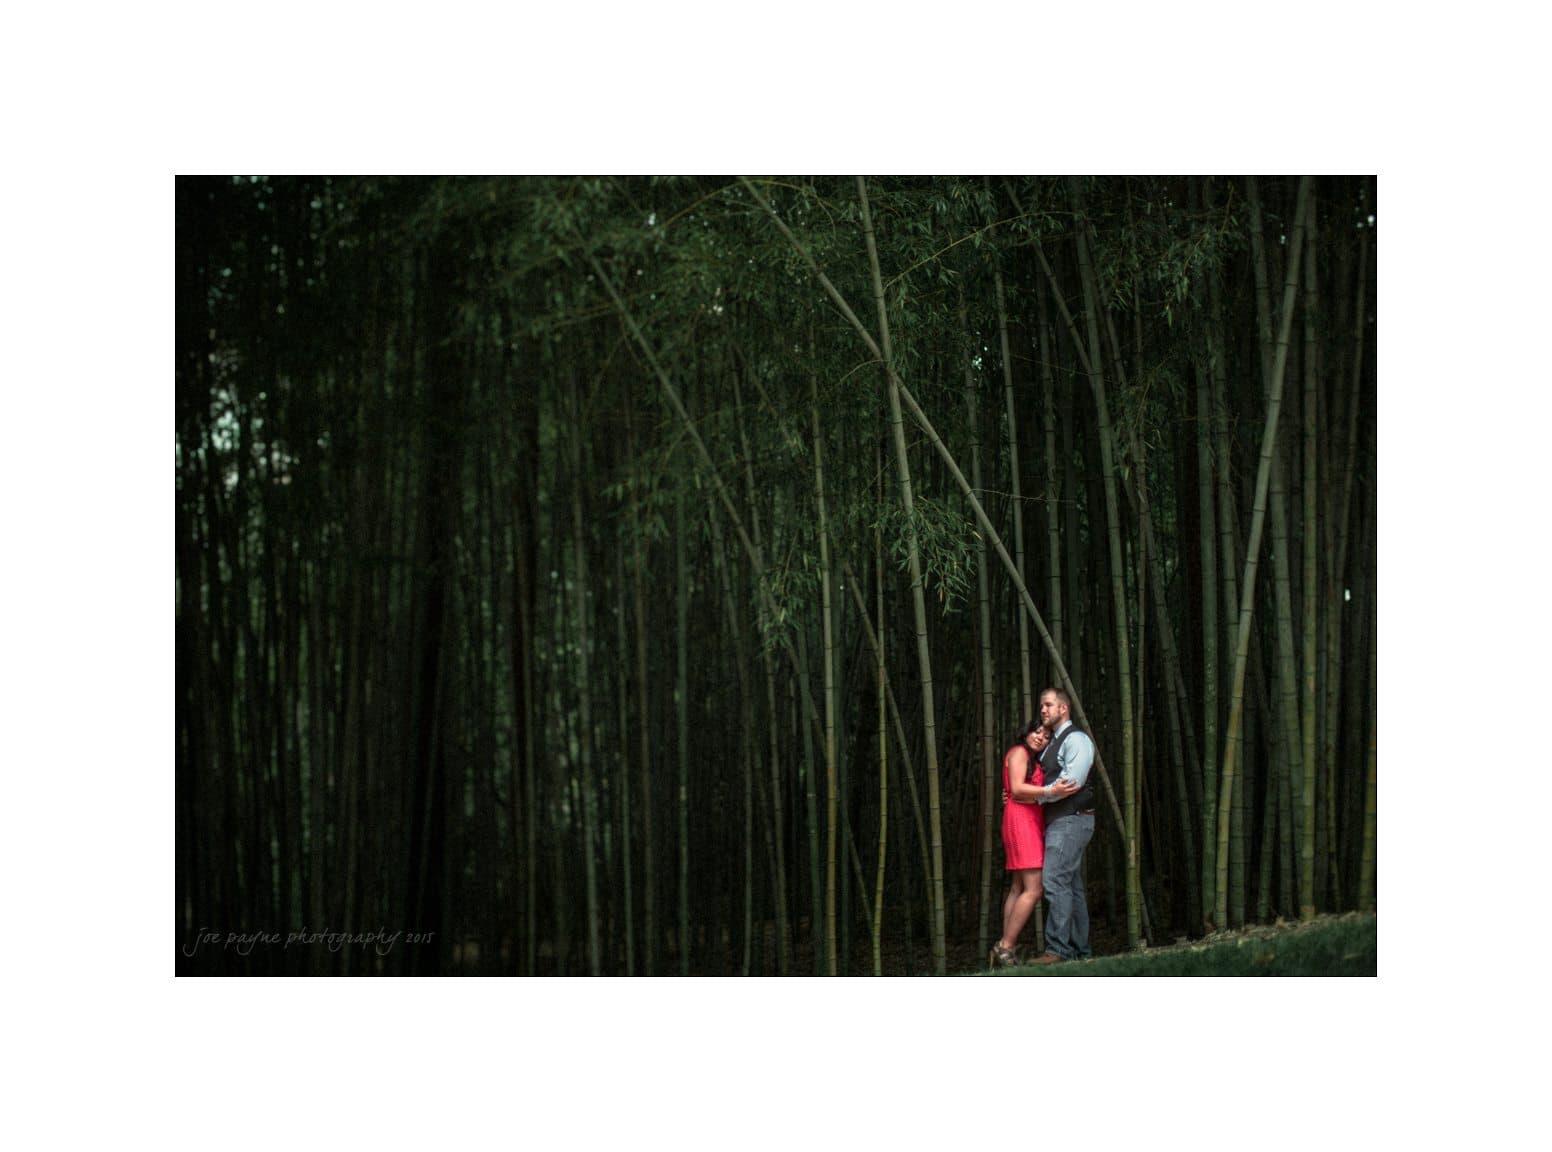 duke gardens engagement photography bamboo